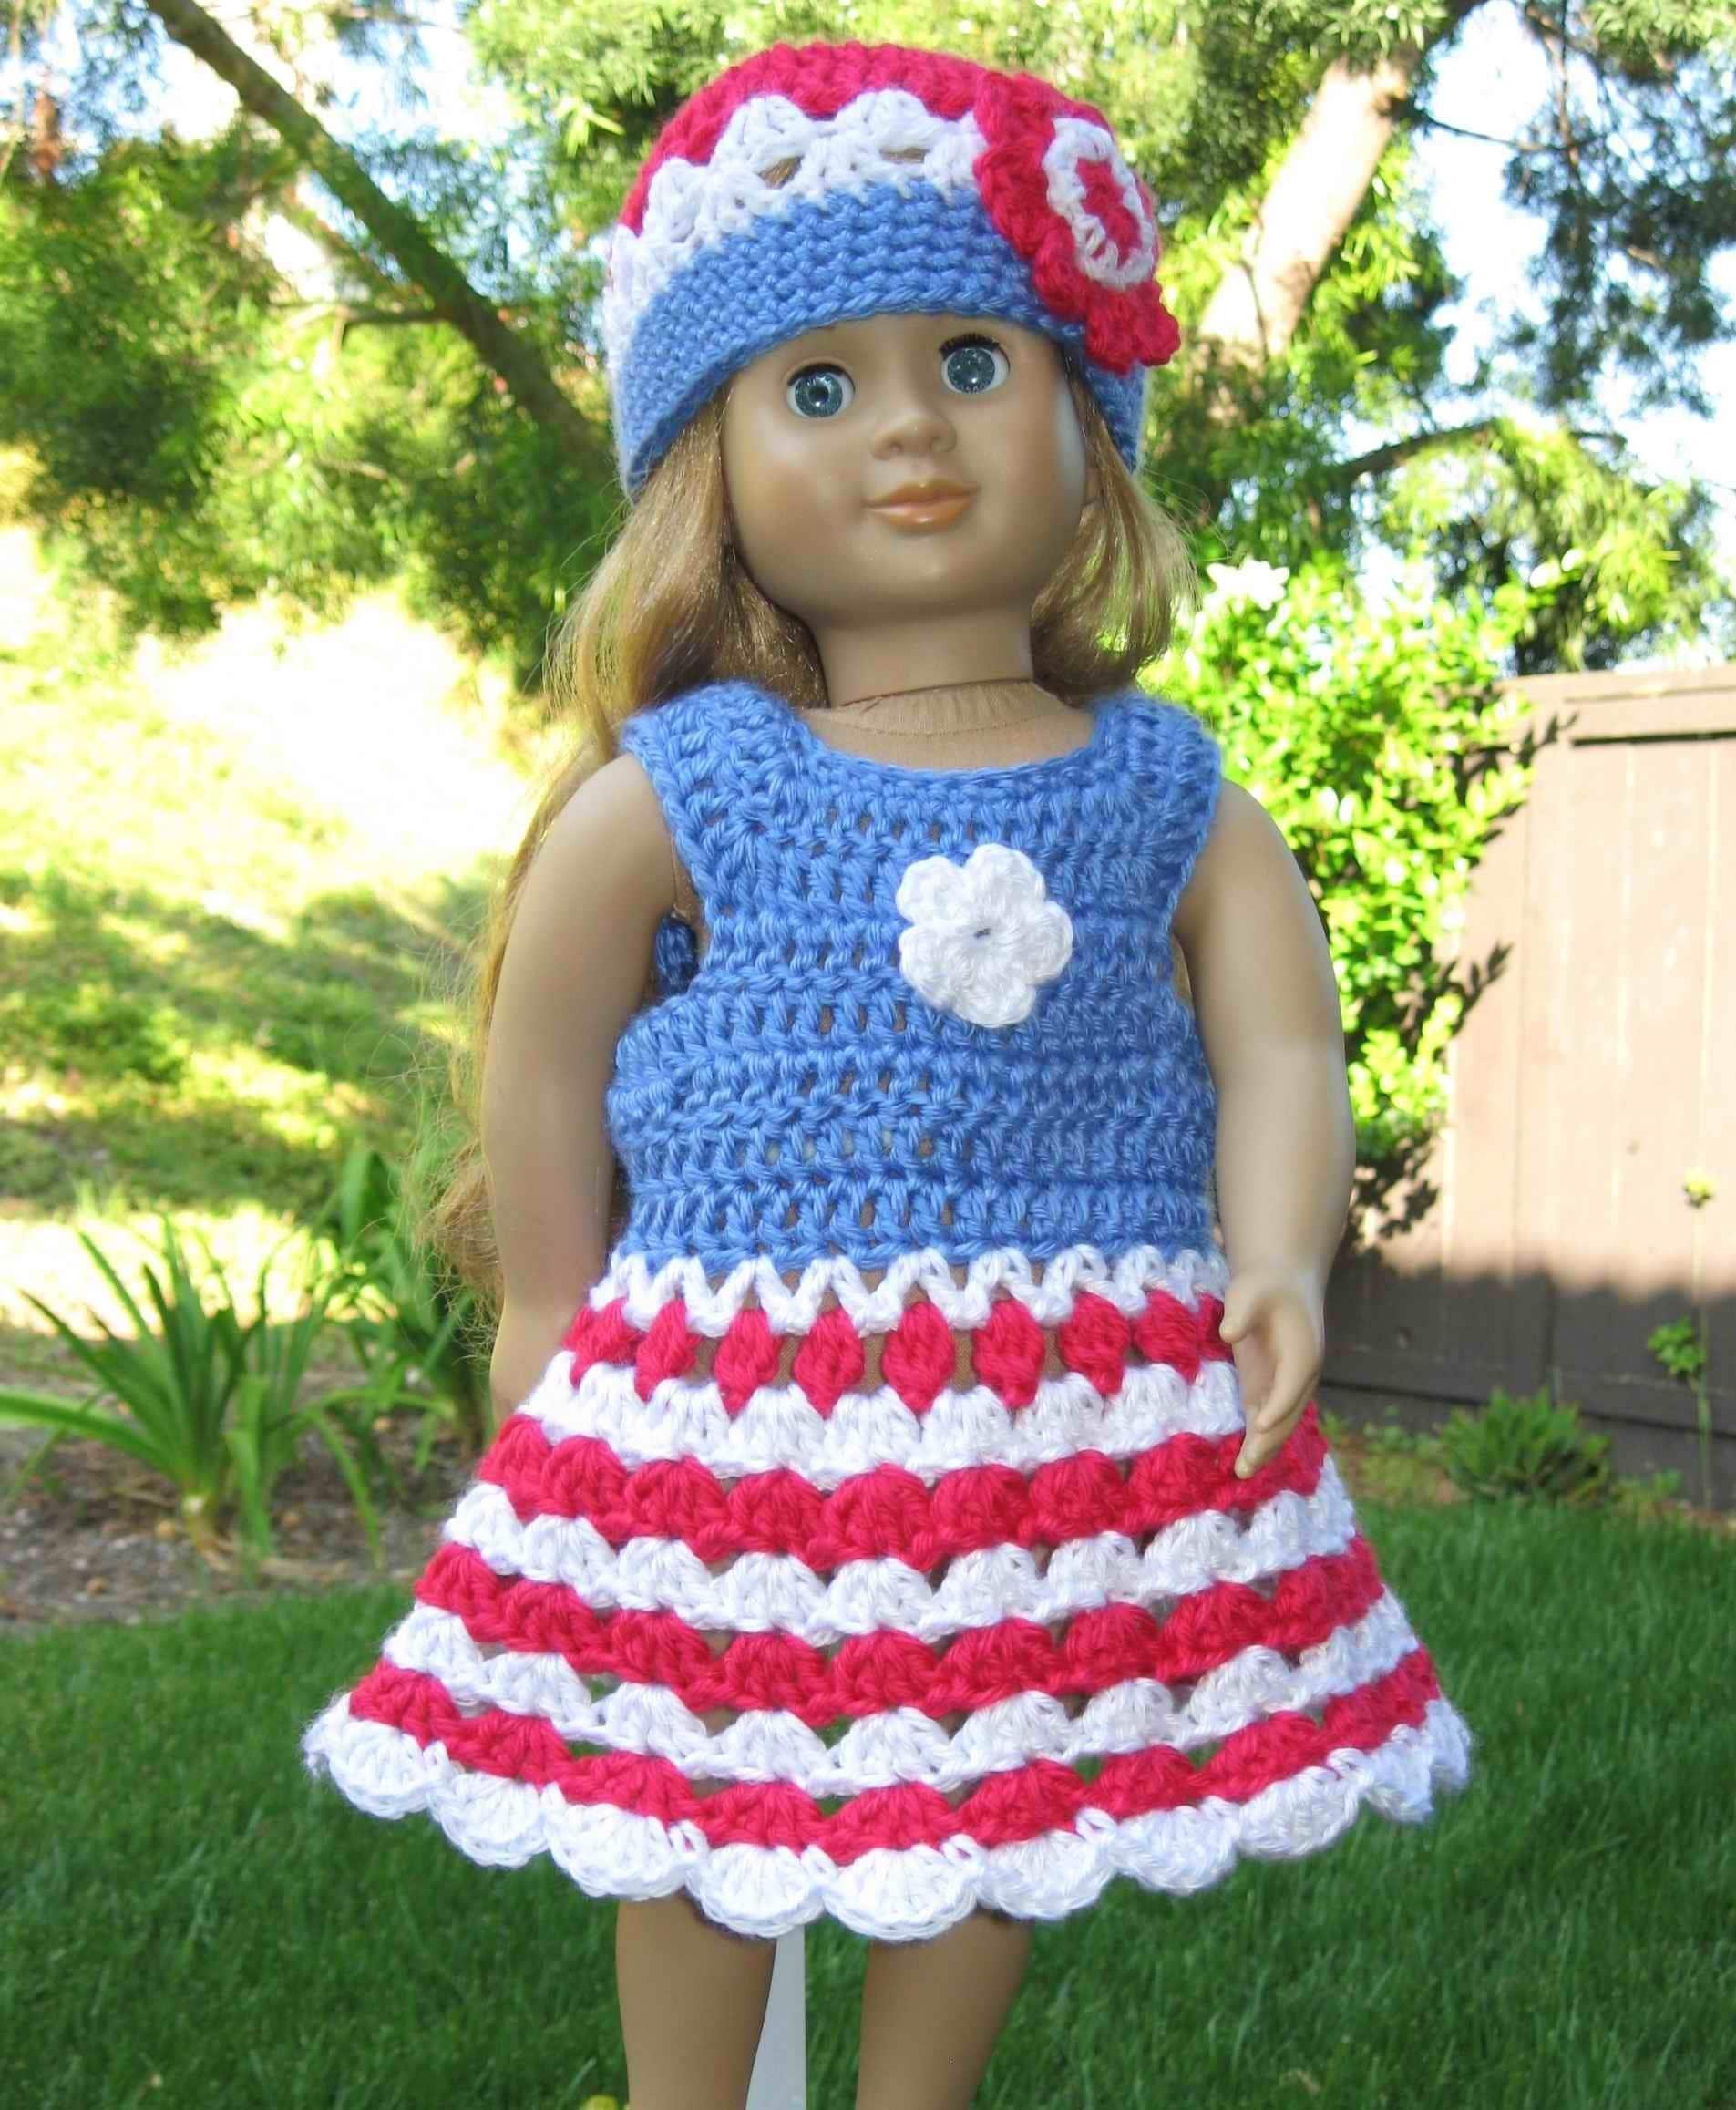 Crochet Pattern Central American Girl : Pattern in PDF crocheted doll dress for American Girl Gotz